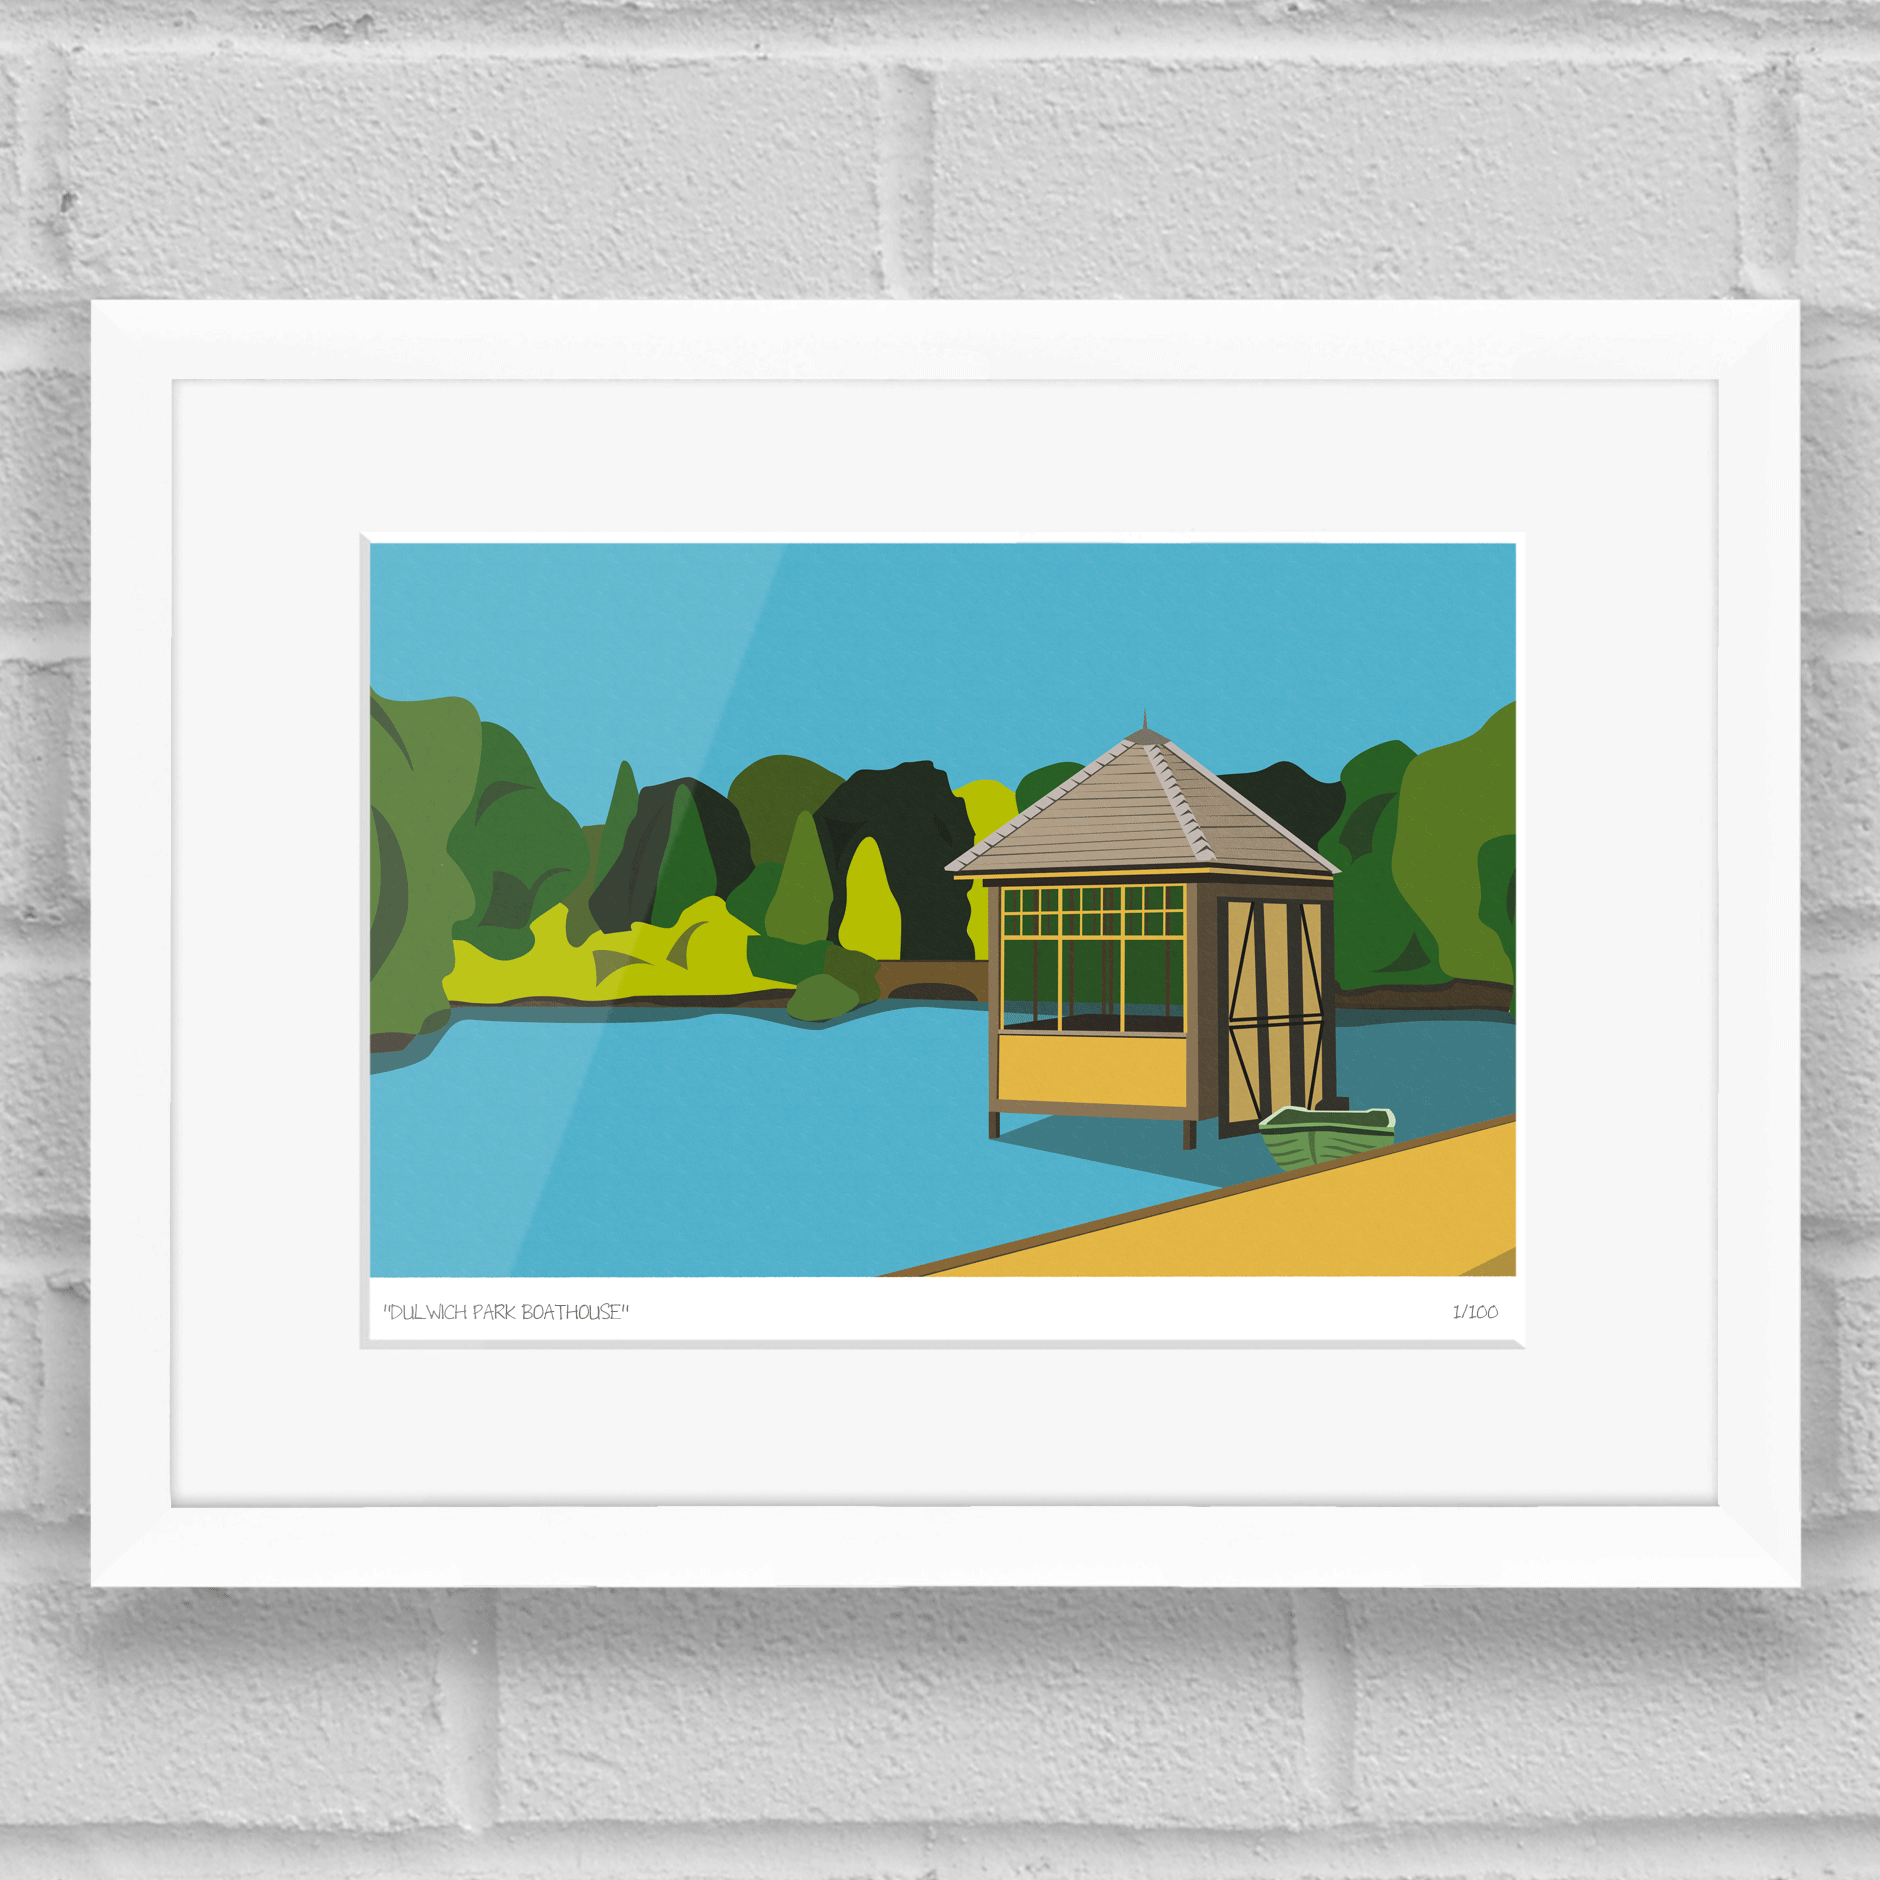 Dulwich Park Boathouse Art Poster Print White Frame